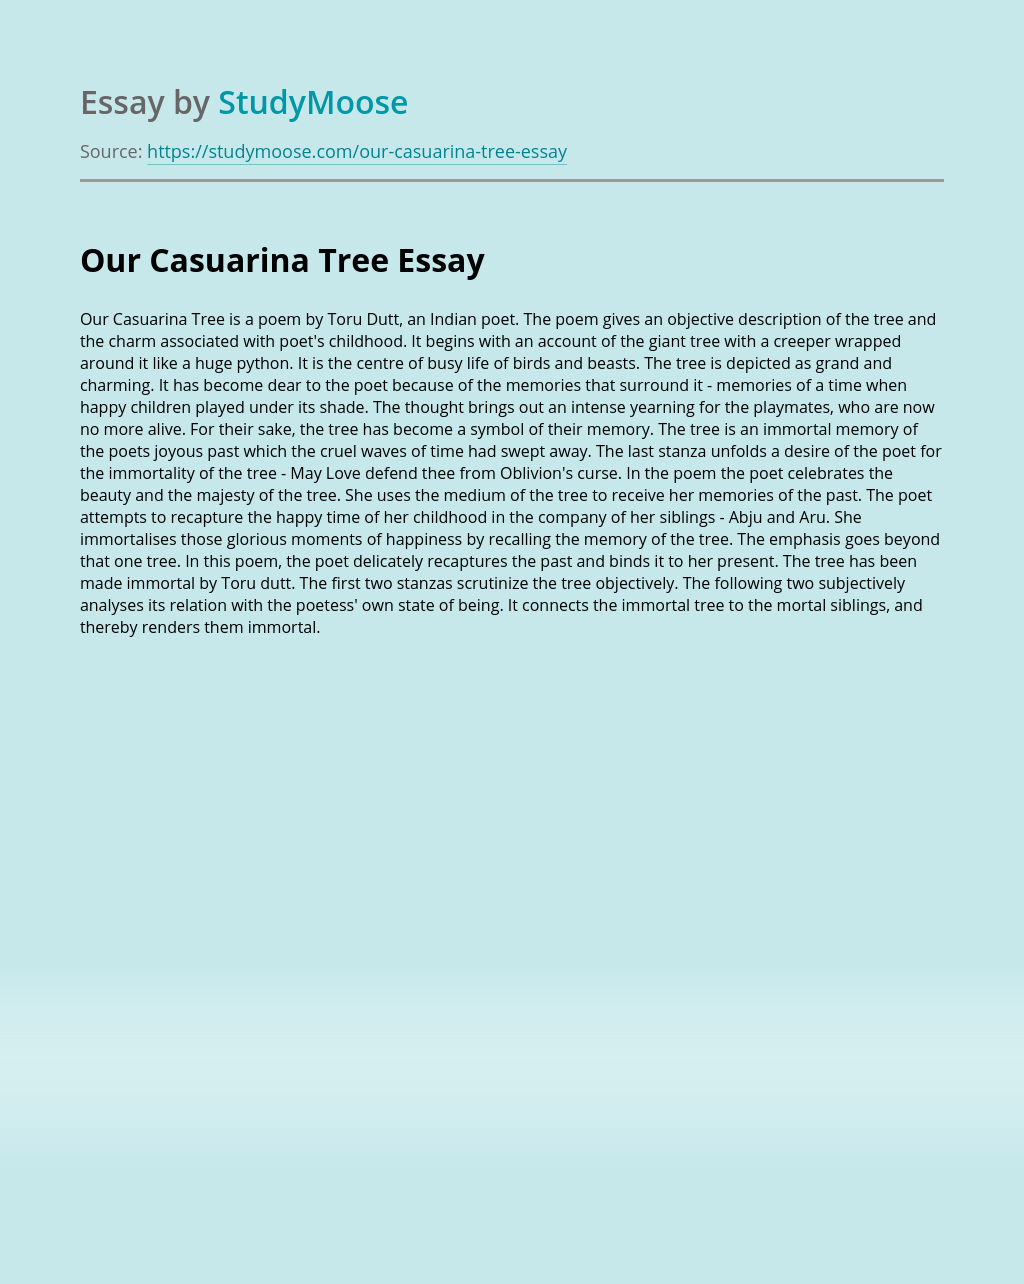 Our Casuarina Tree